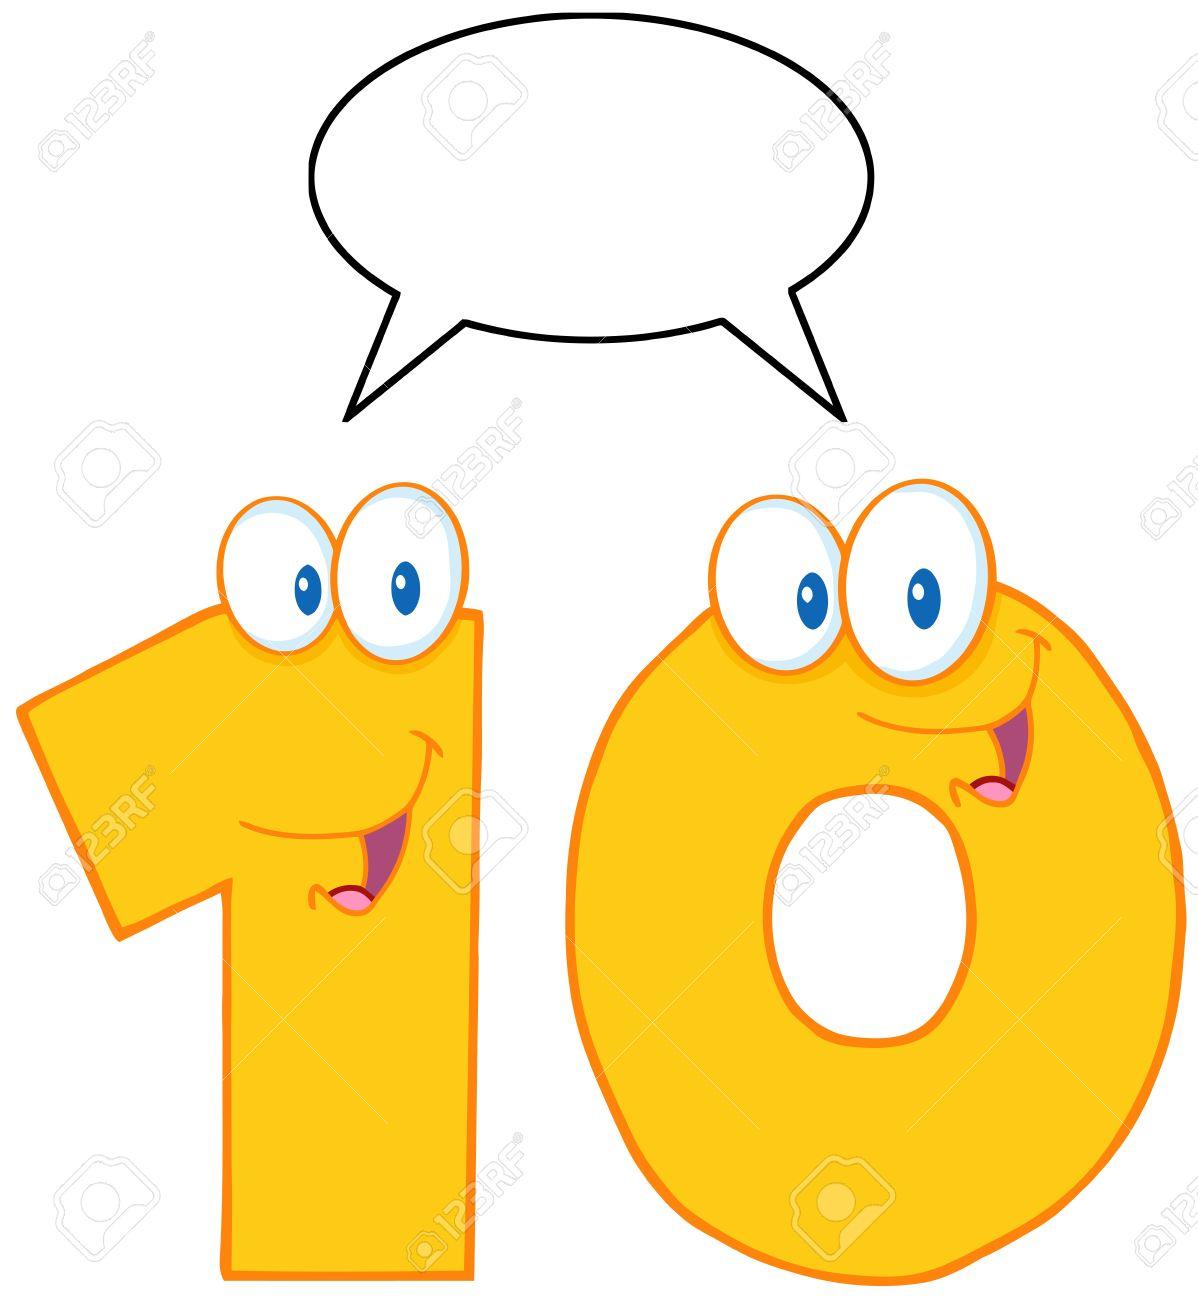 Number Ten Cartoon Mascot Character With Speech Bubble Stock Vector - 15220223